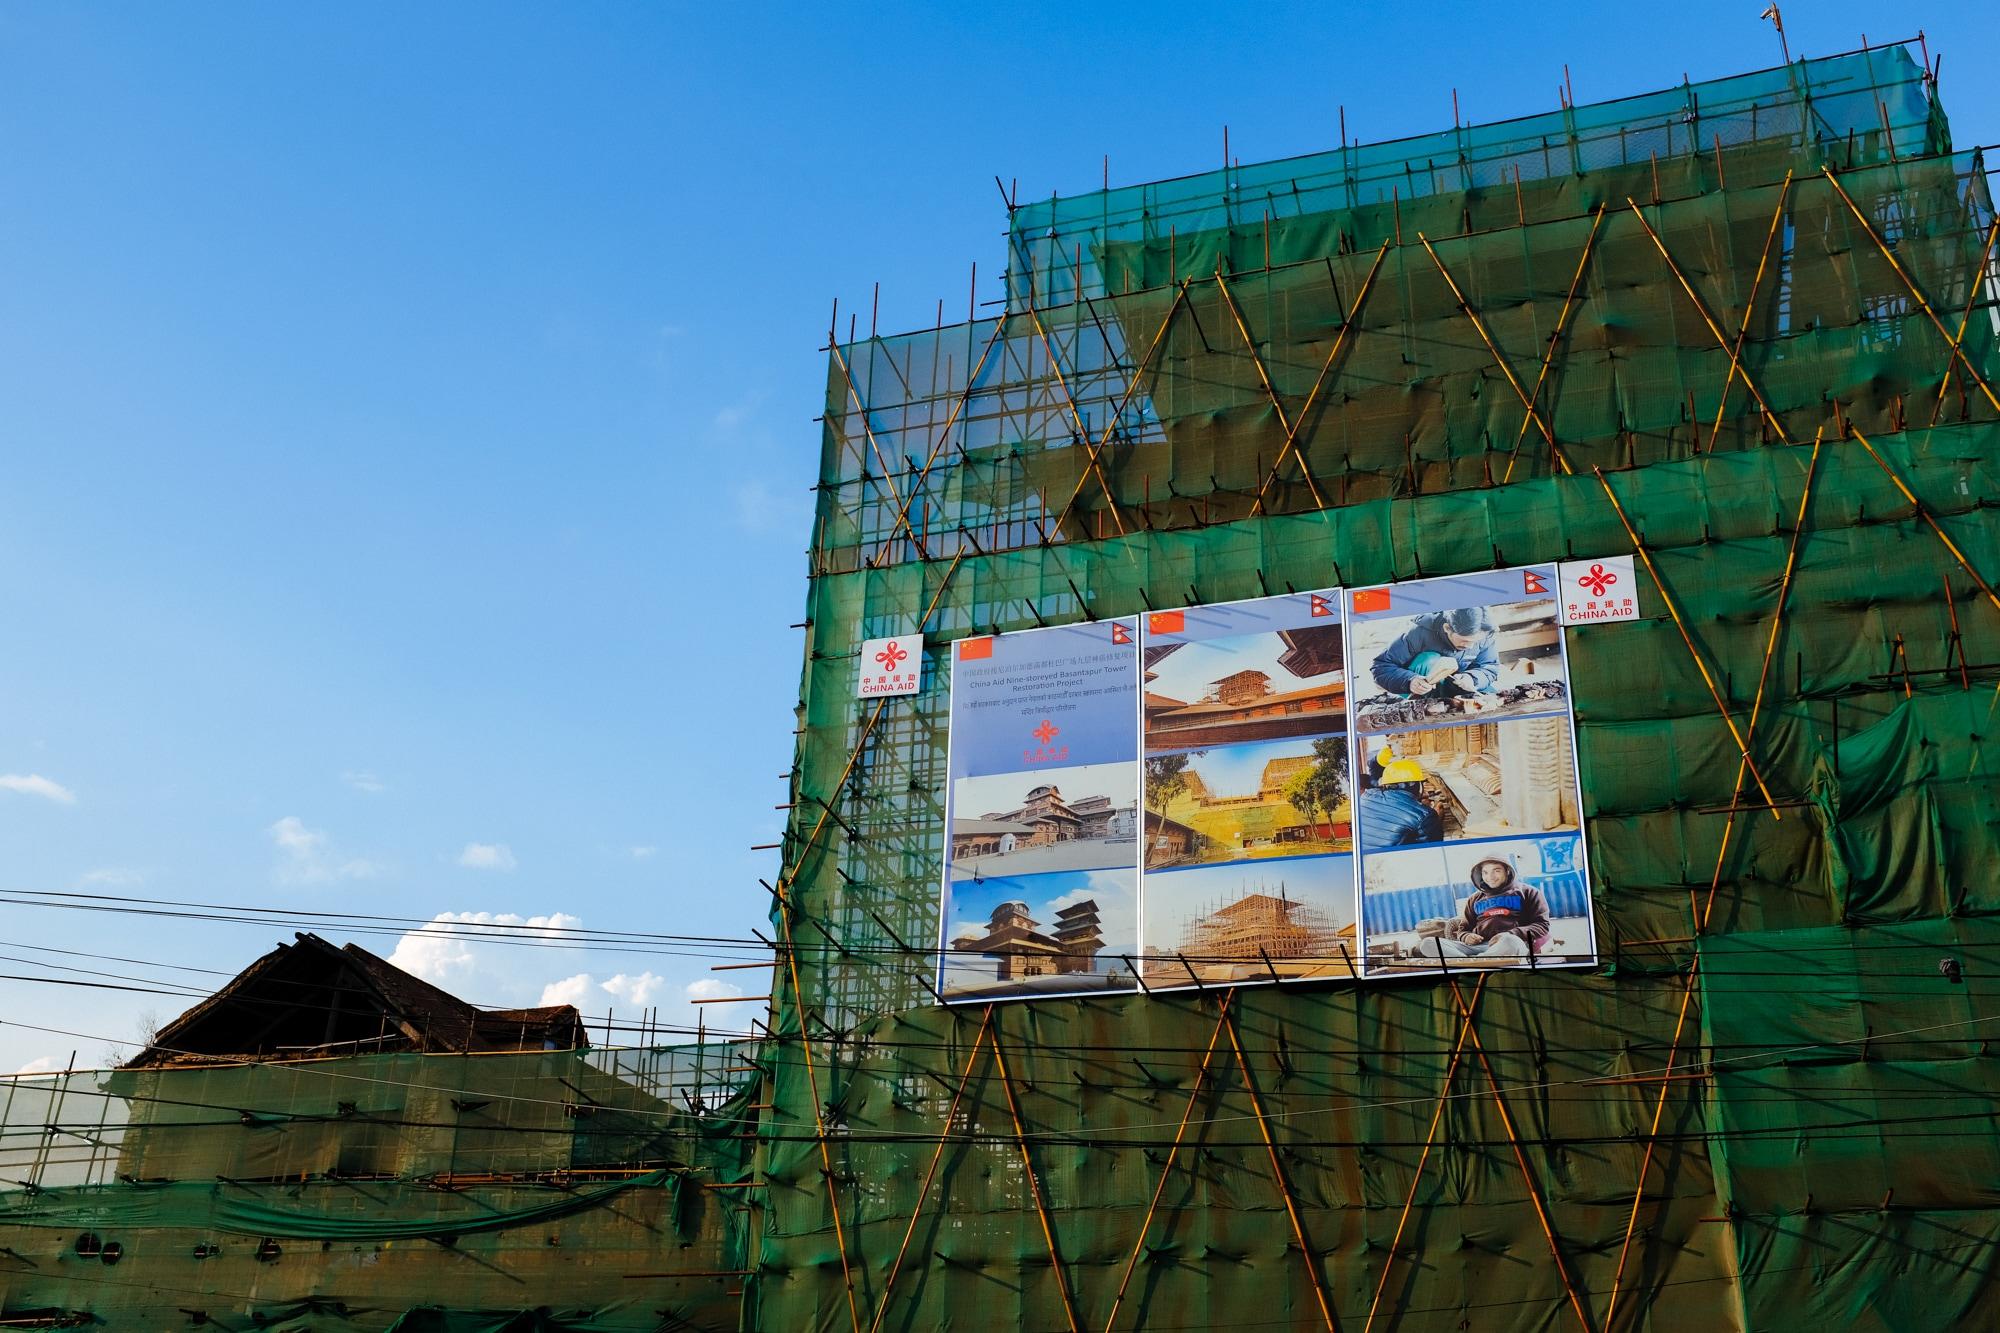 The Basantpur Tower restoration project at Kathmandu Durbar Square